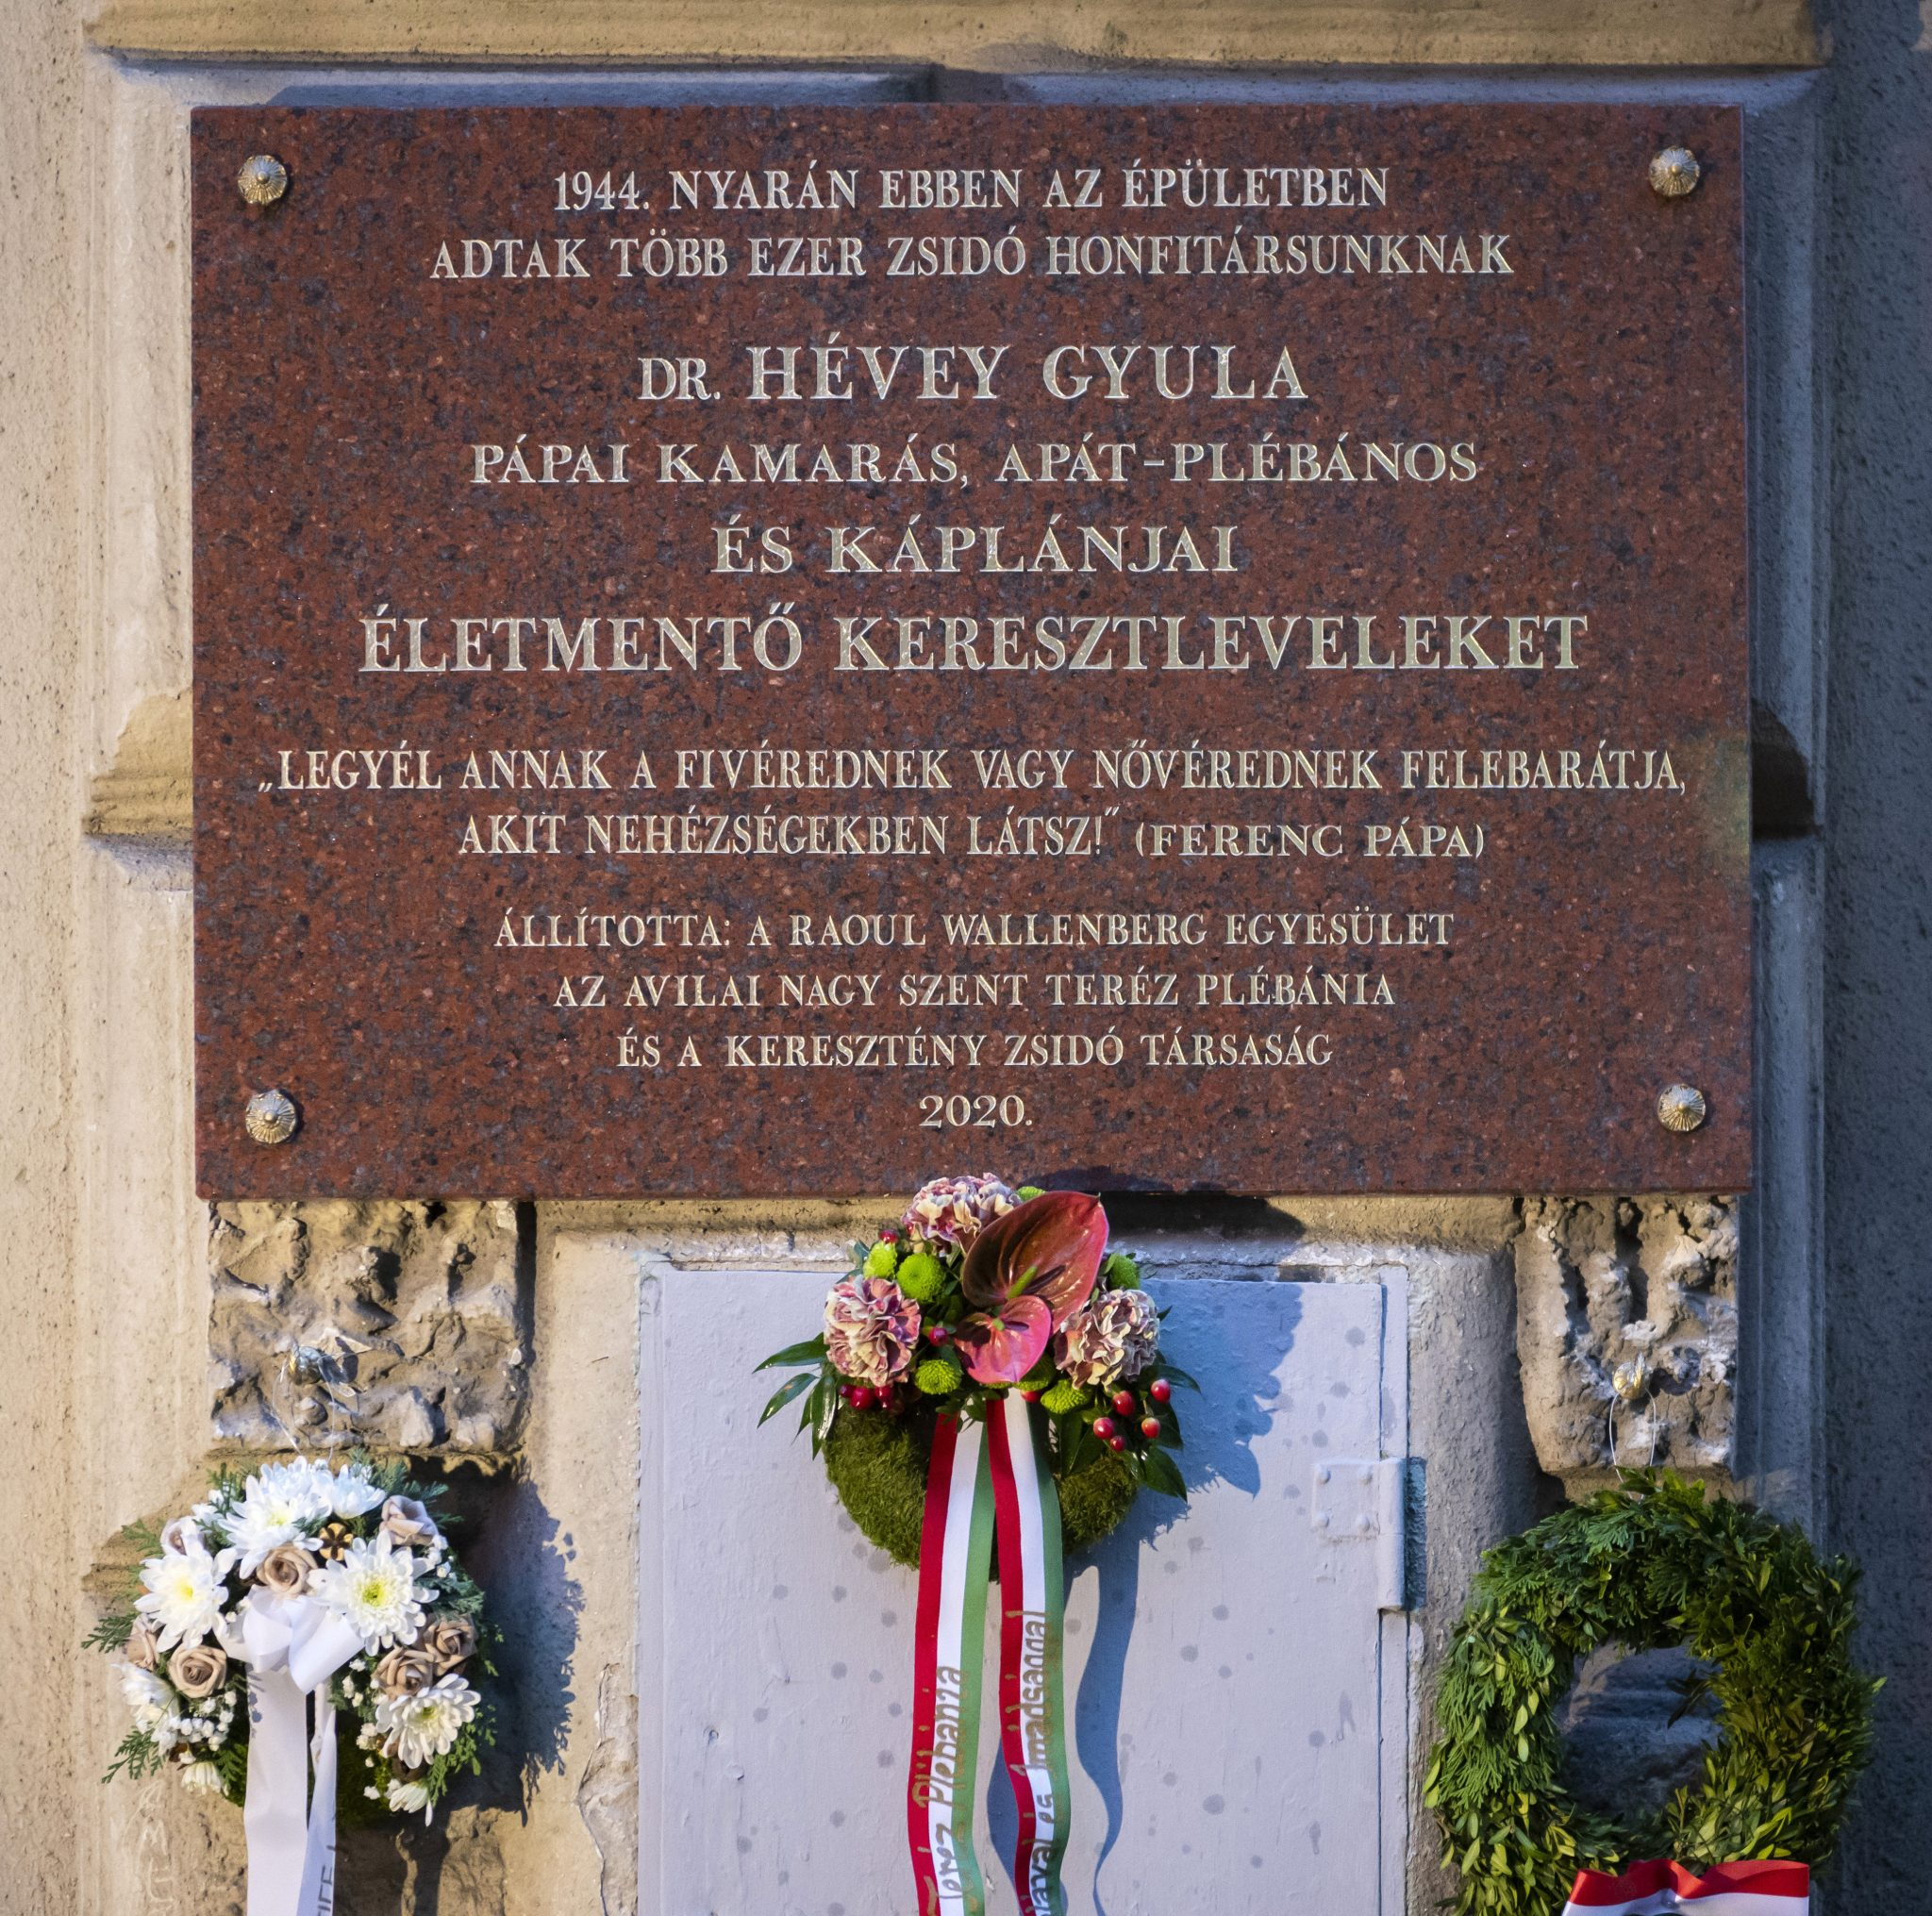 Judenretter Priester bekommt Gedenktafel in Budapest post's picture